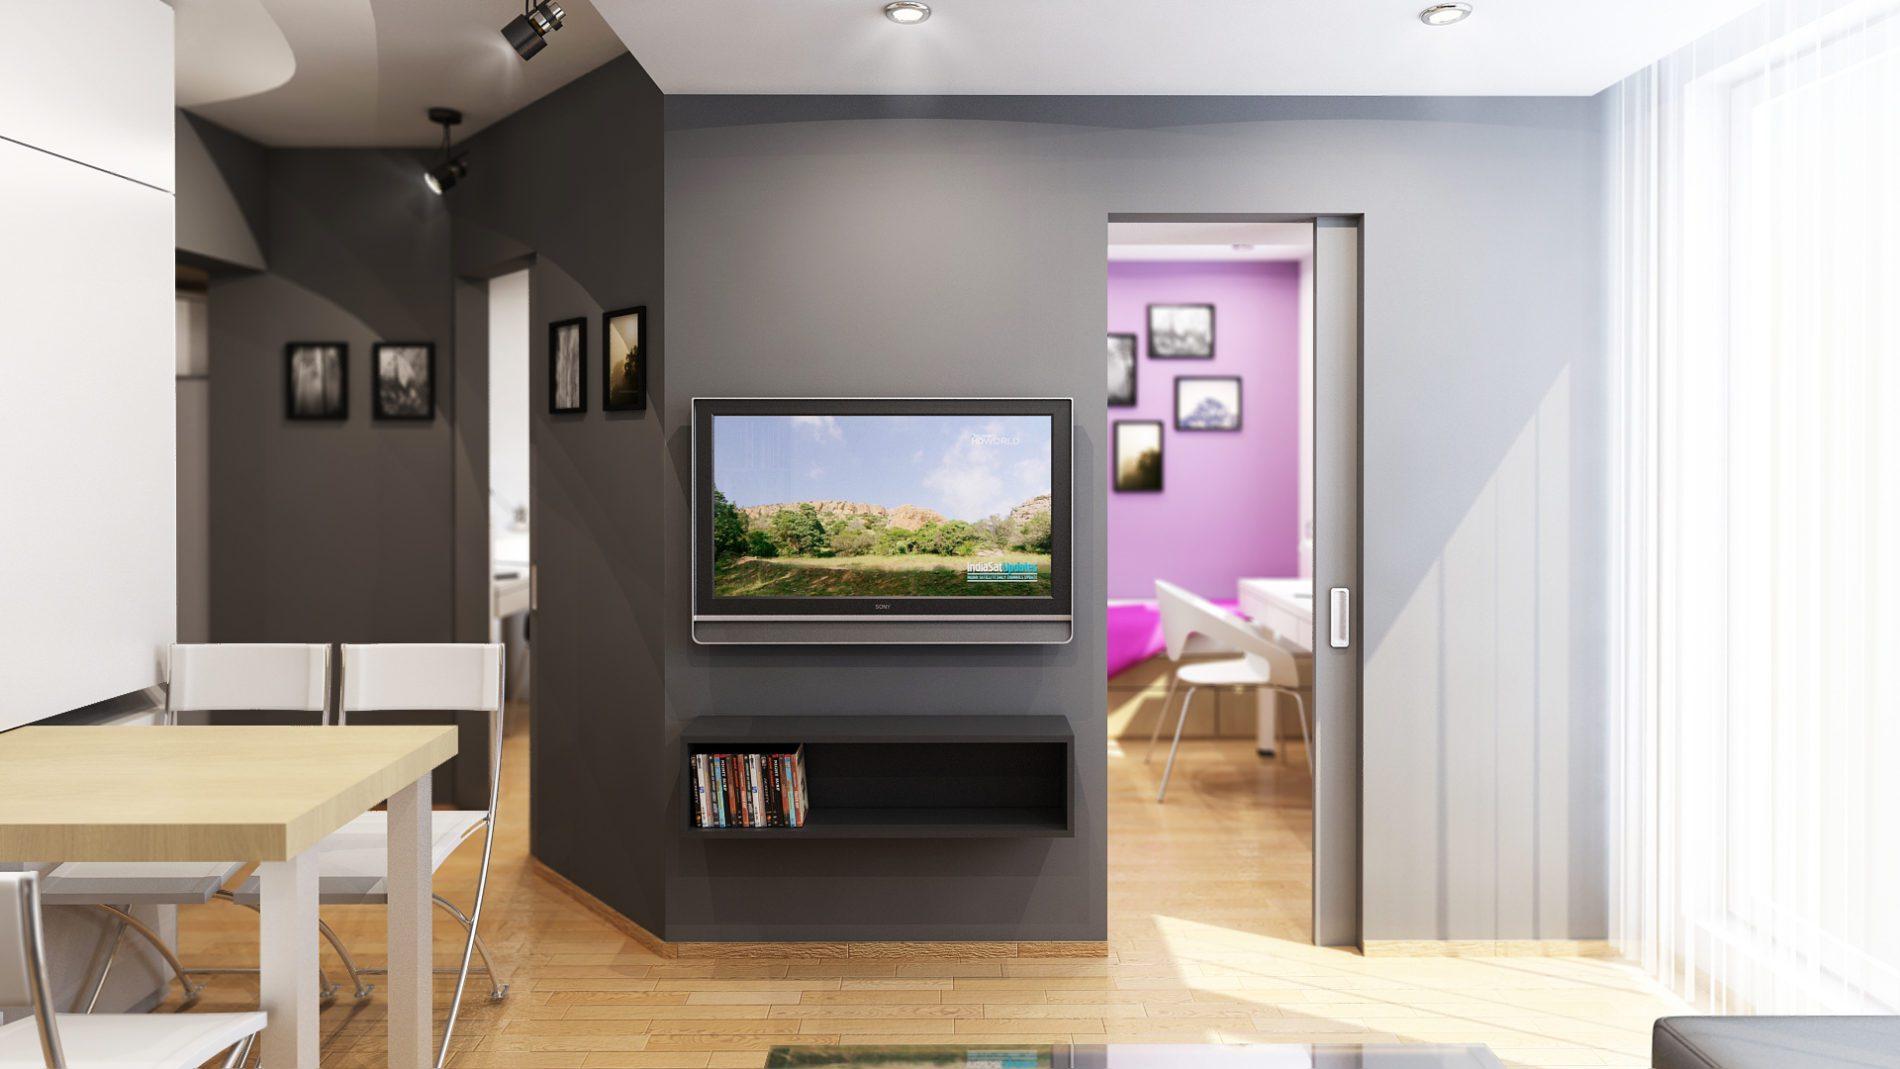 projekt salonu w niewielkim mieszkaniu